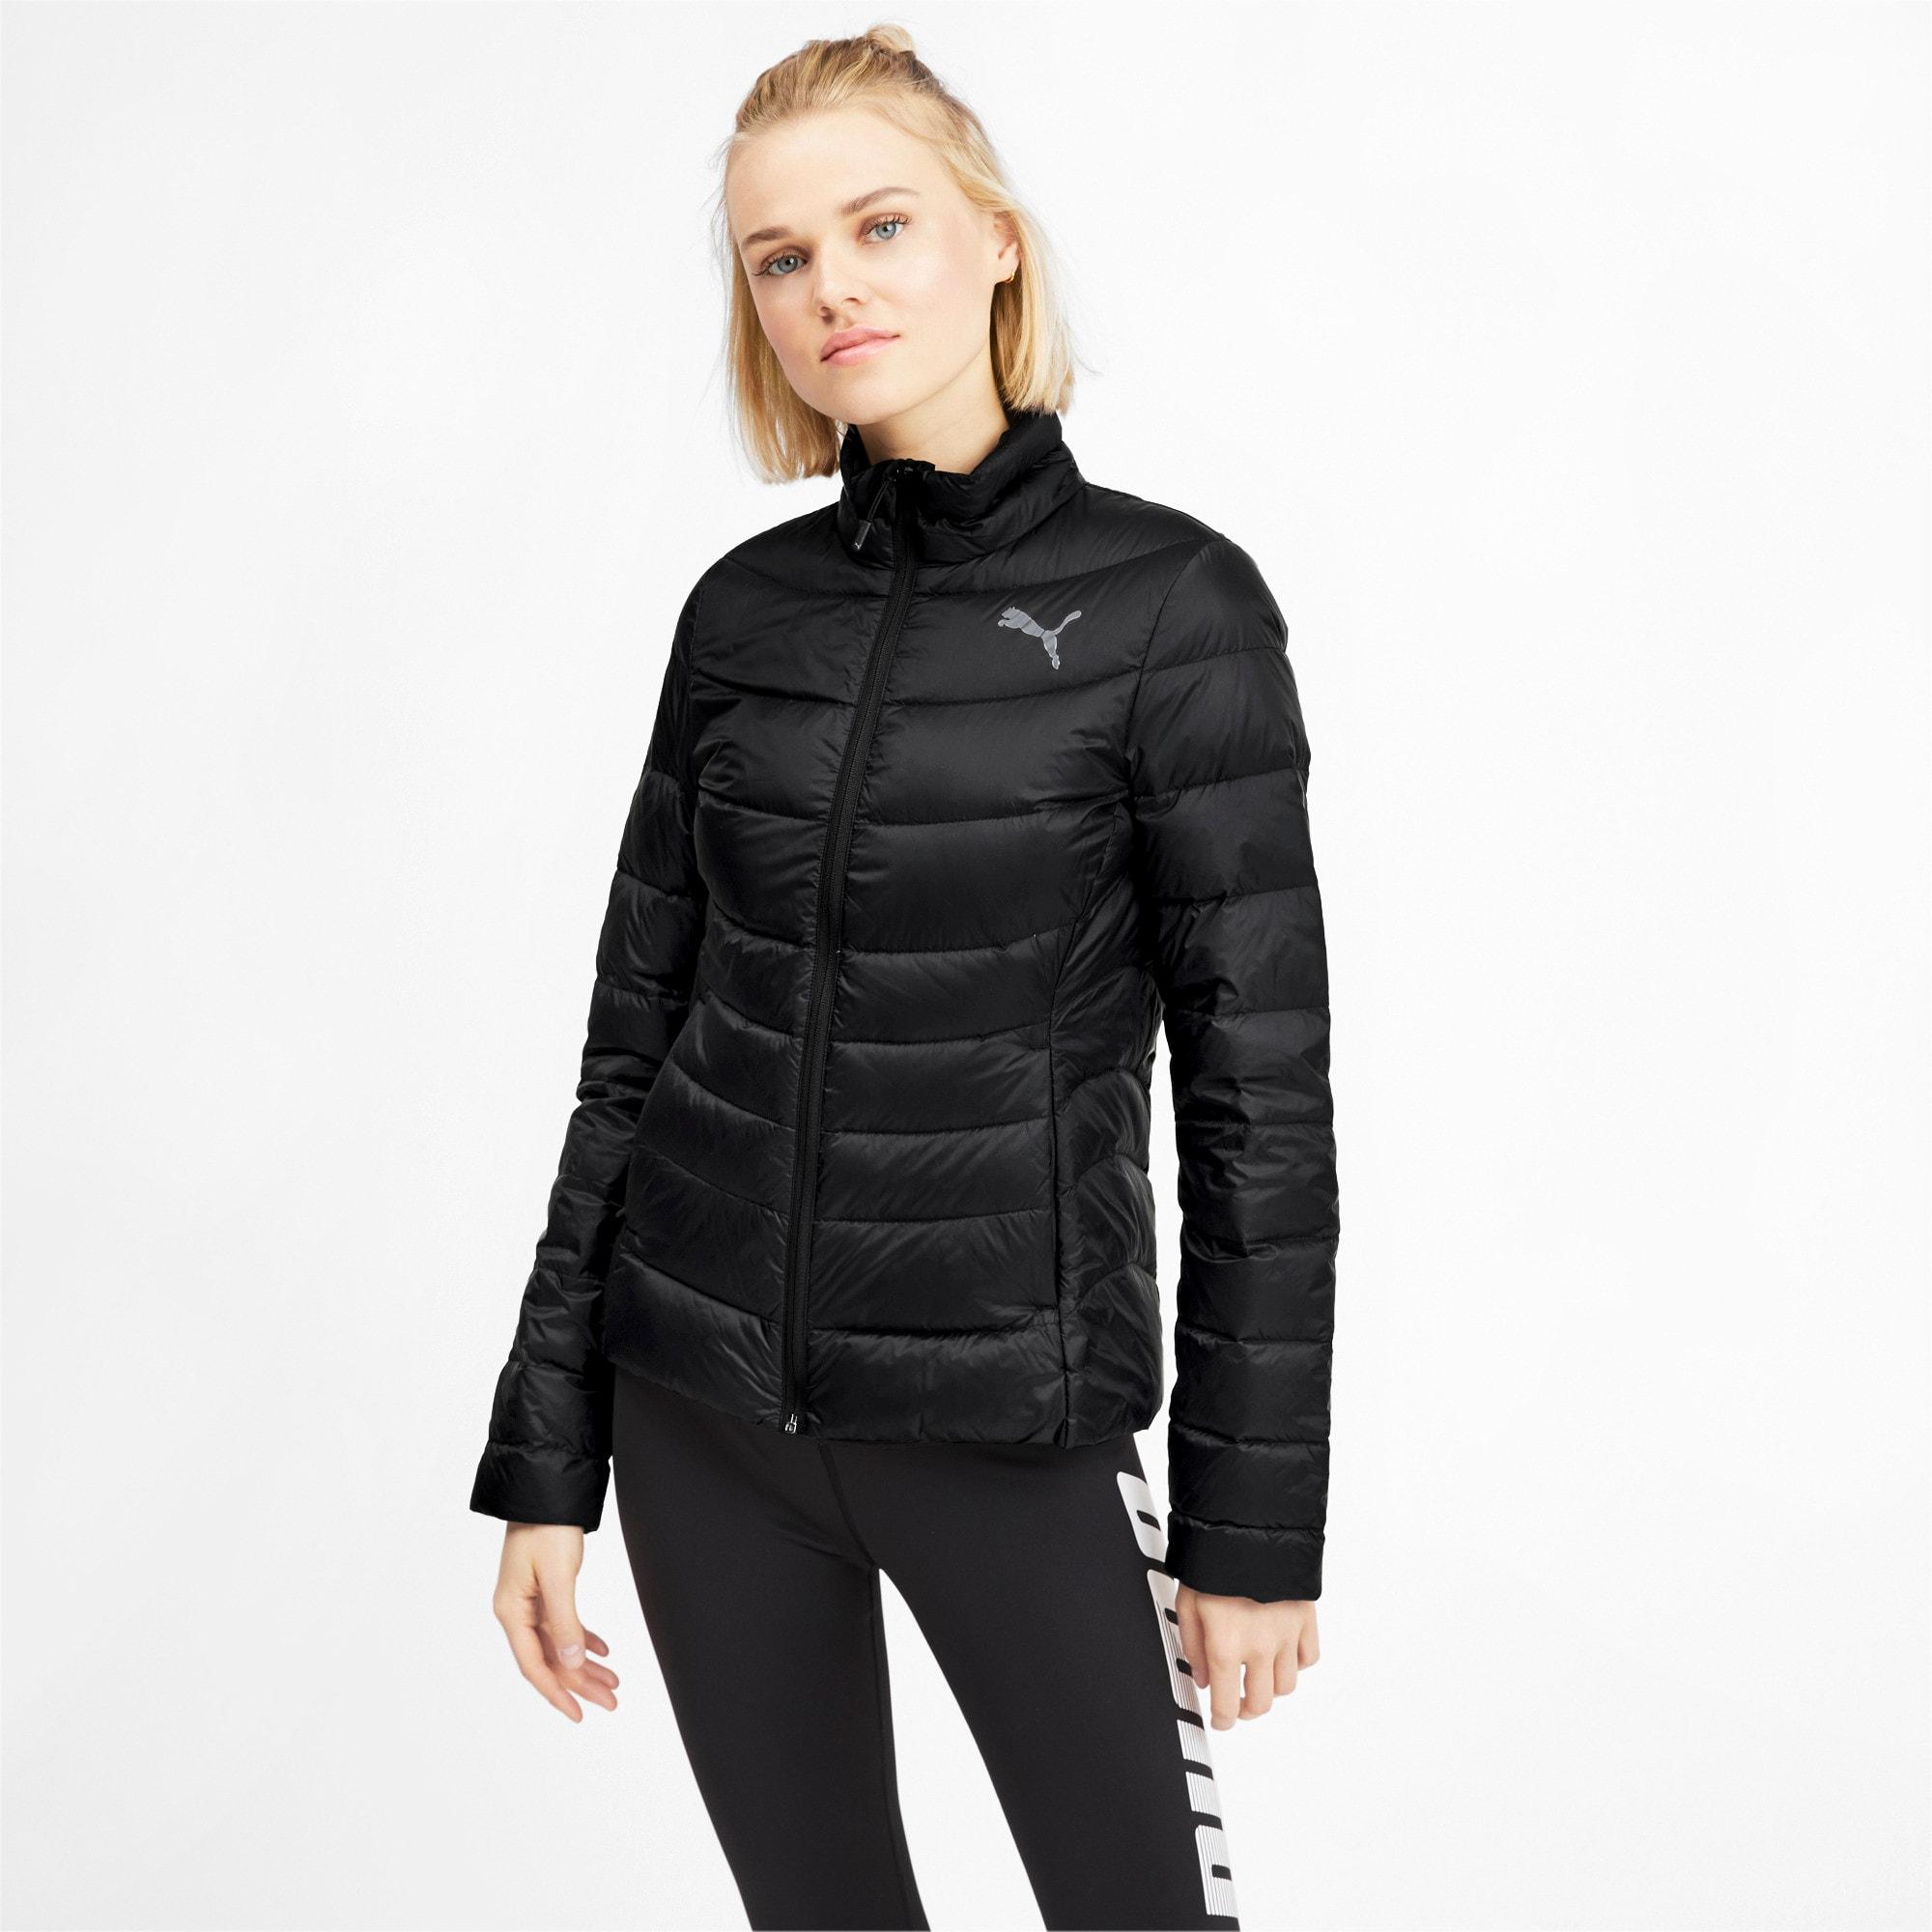 Thumbnail 1 of PWRWarm packLITE 600 Down Women's Jacket, Puma Black, medium